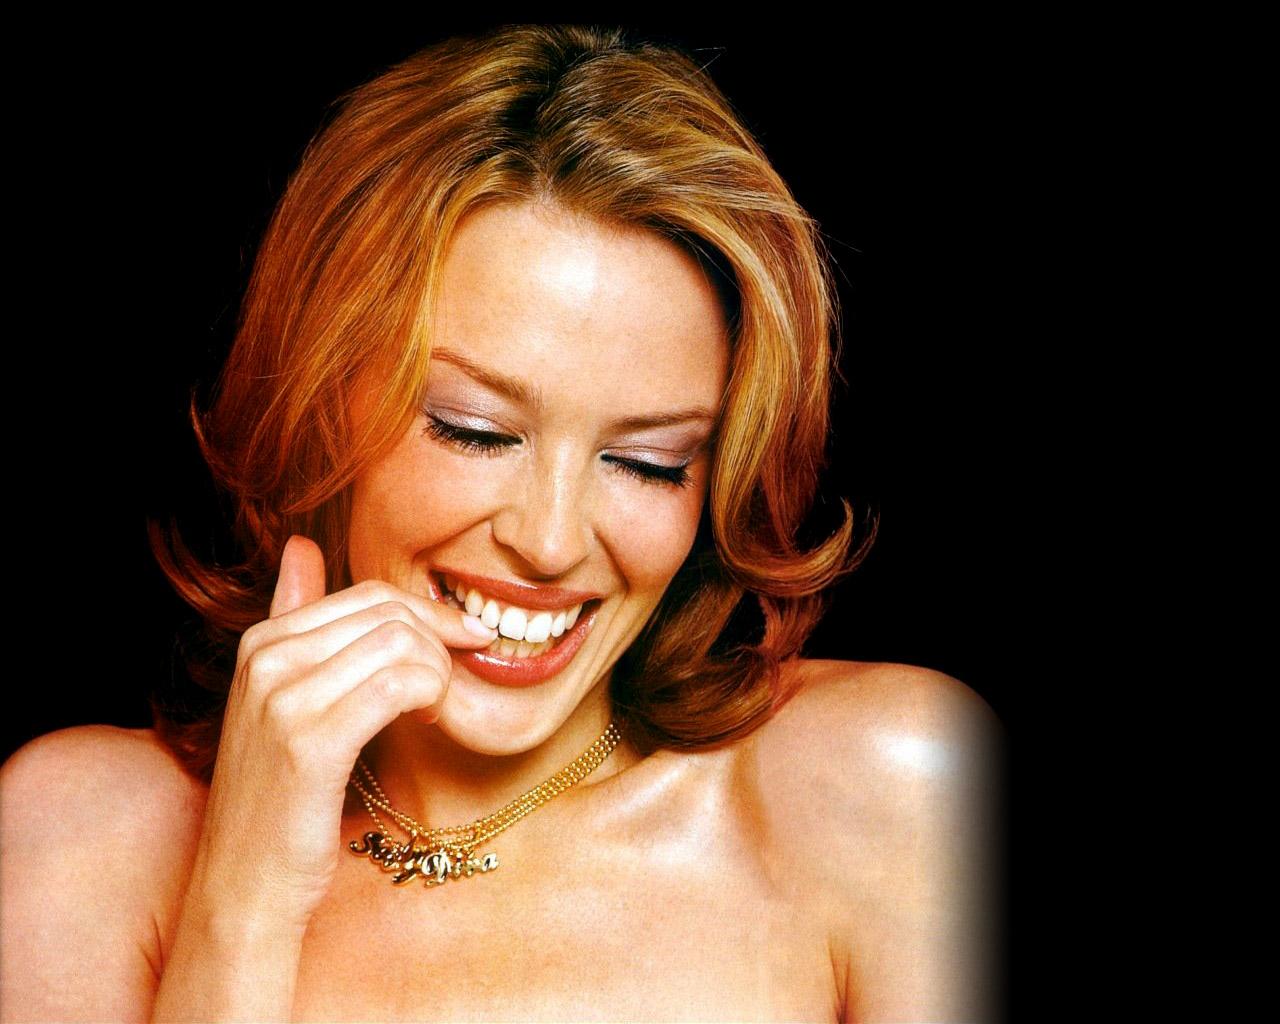 http://4.bp.blogspot.com/-w0RMyfM1O1c/T_tRCxiWU9I/AAAAAAAACz0/Asqg9lOvcXI/s1600/Kylie_Minogue_27.jpg